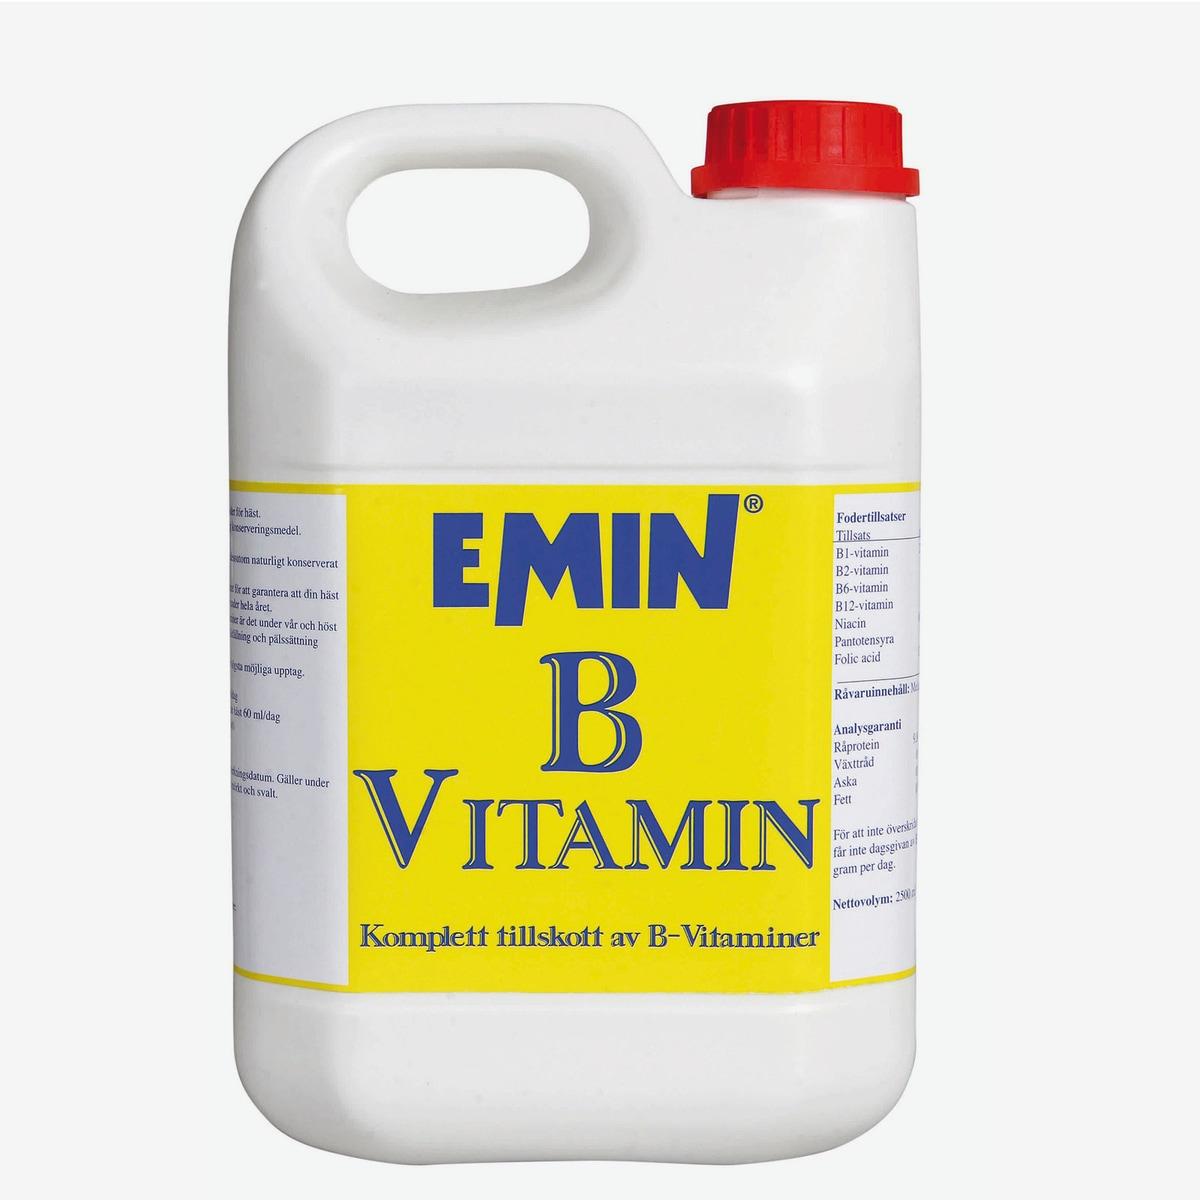 Emin B-vitamin, 2500 ml (Levering*)